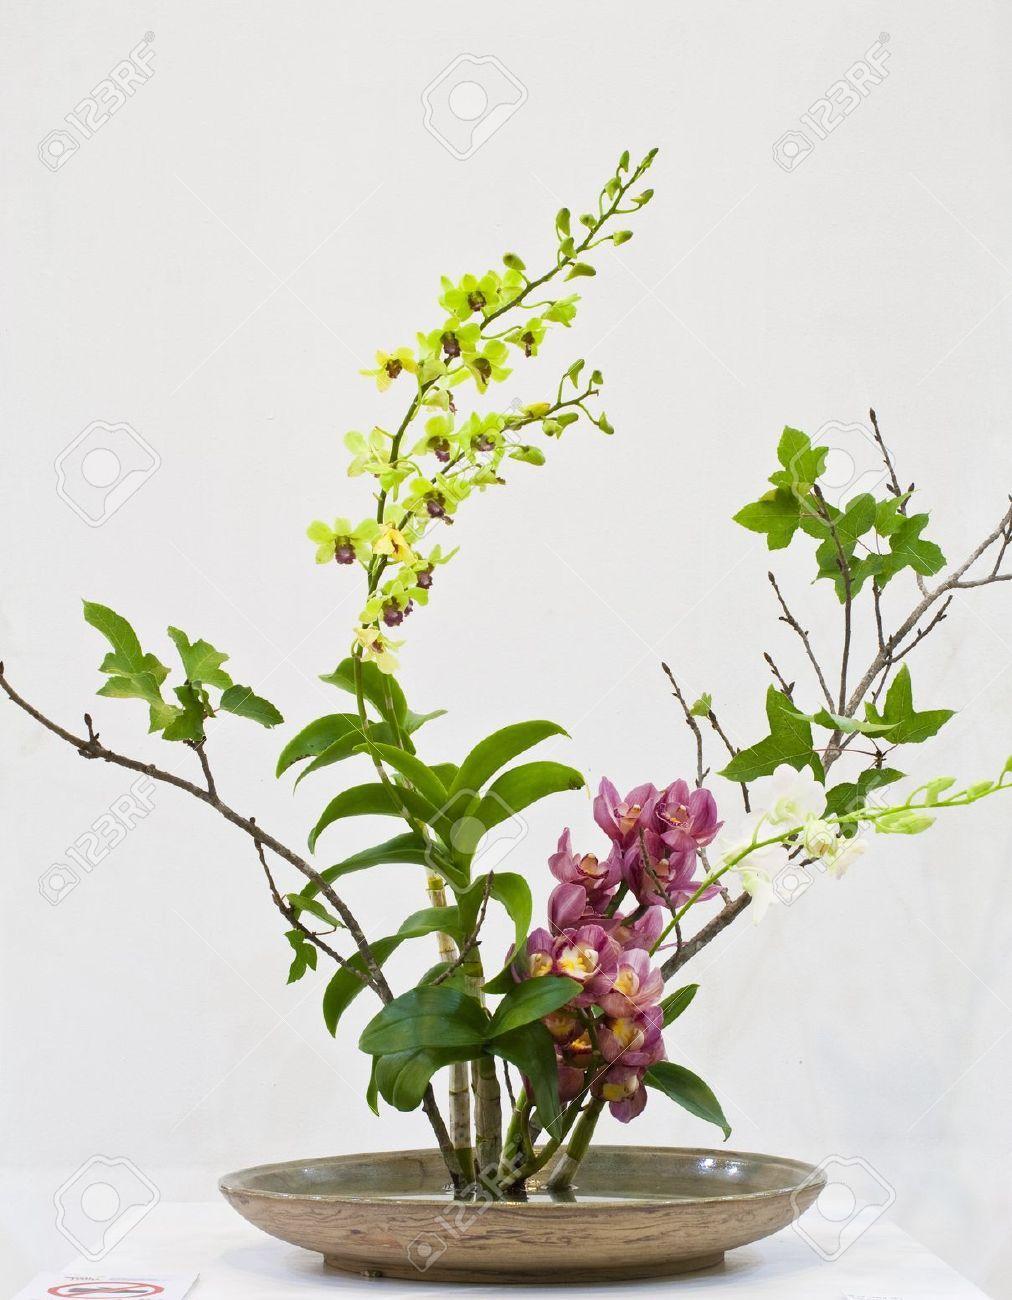 Ikebana flower arrangements pesquisa google